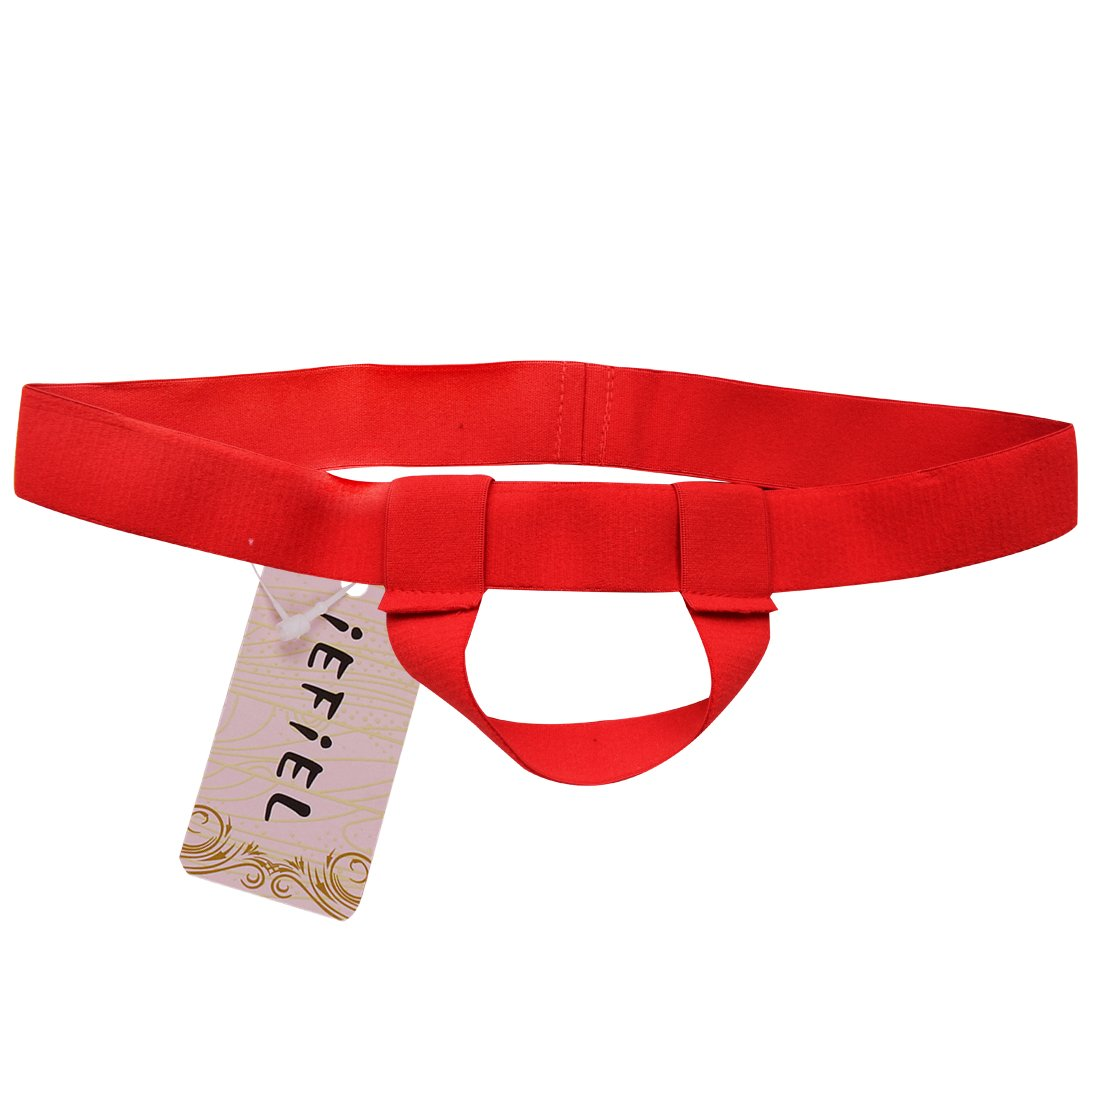 iEFiEL Mens Bare Back Sliding Ring Enhancing Strap Underwear Underpants T-Back (Red)